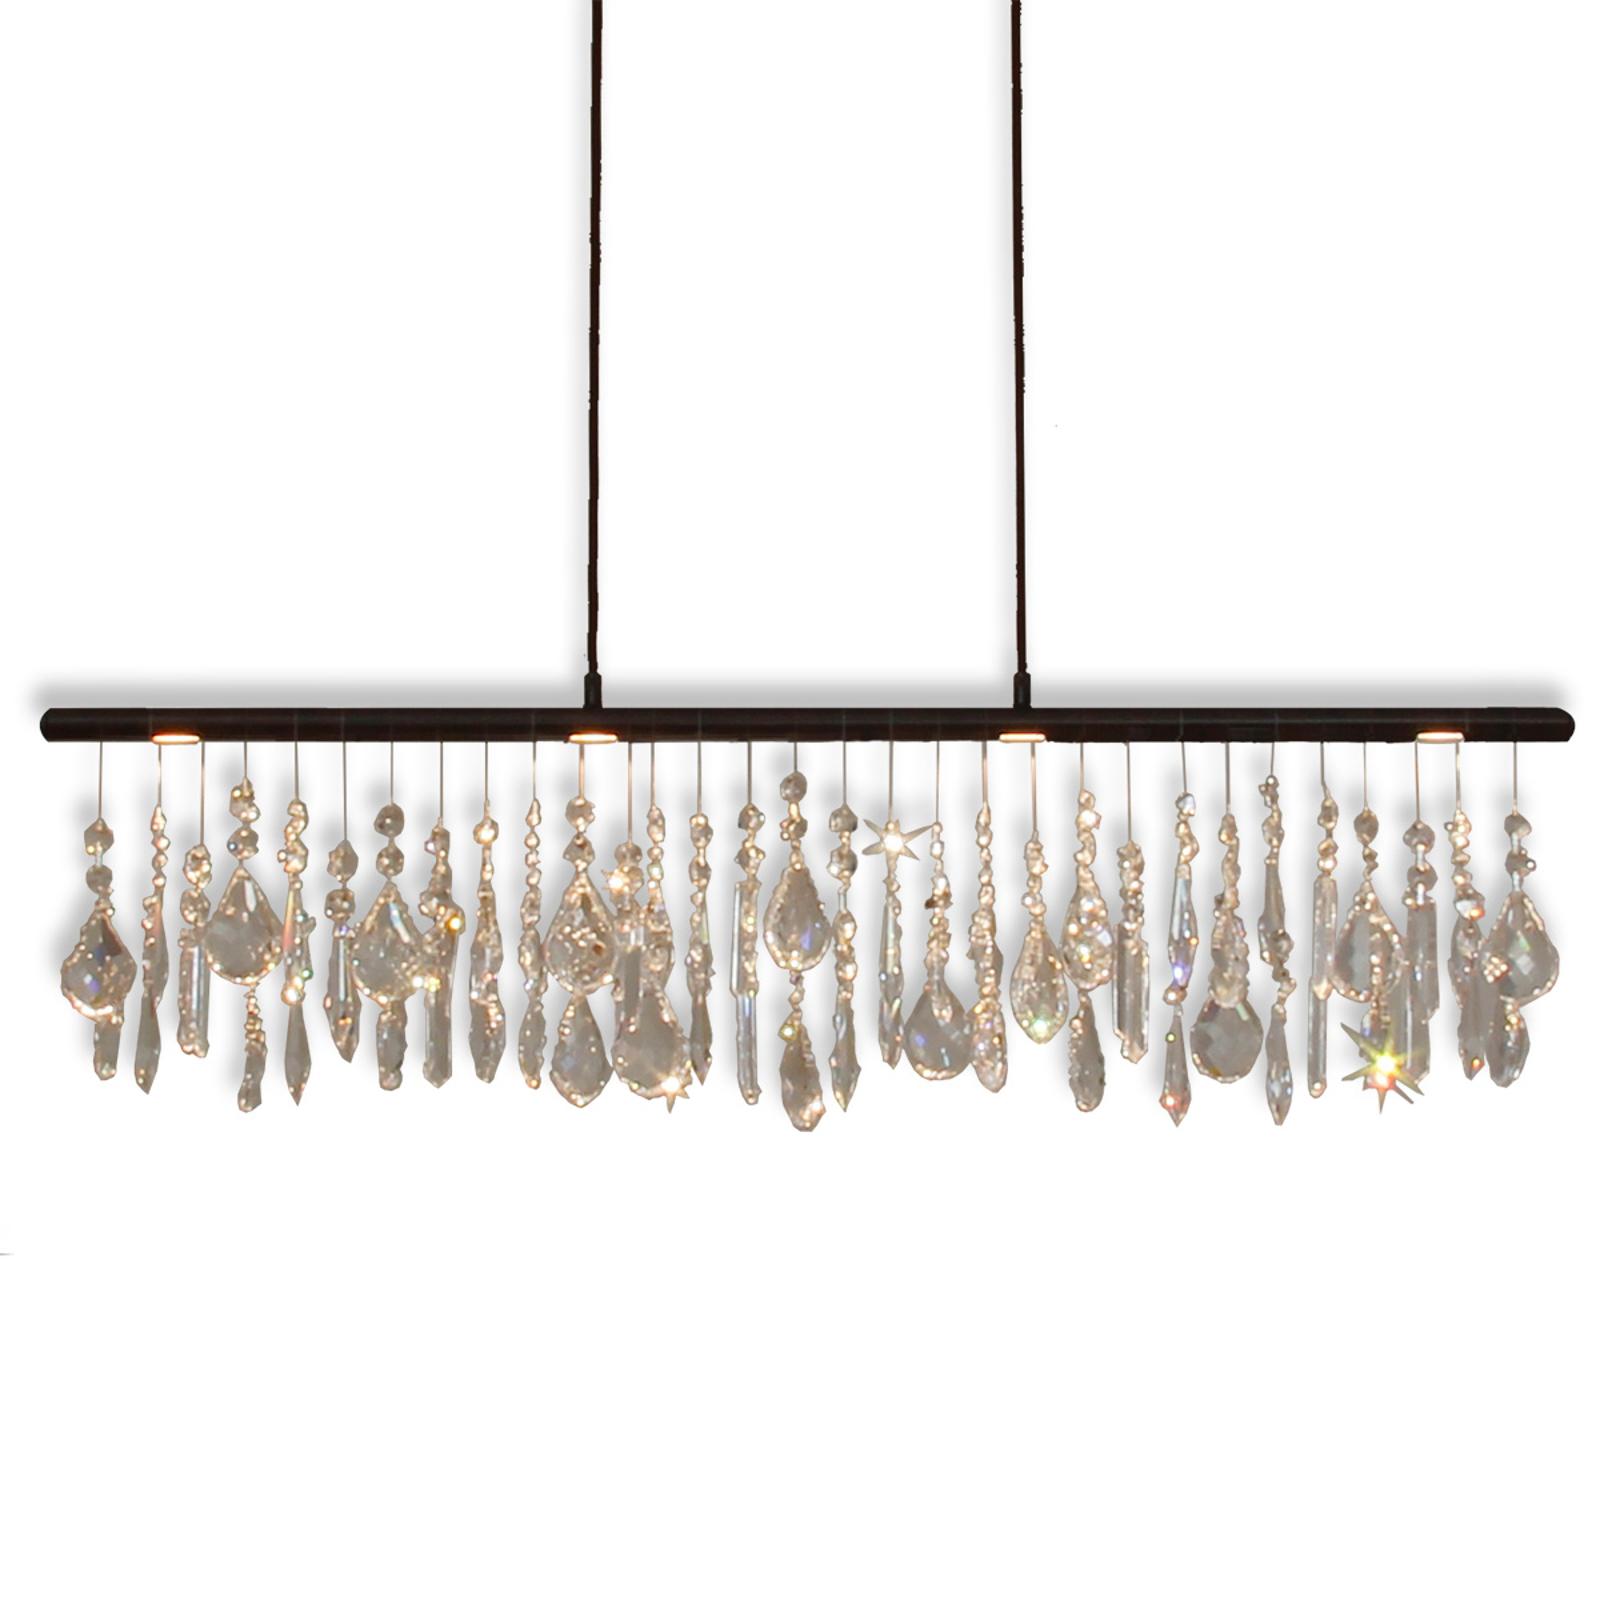 Menzel Anteo LED-hengelampe, krystall